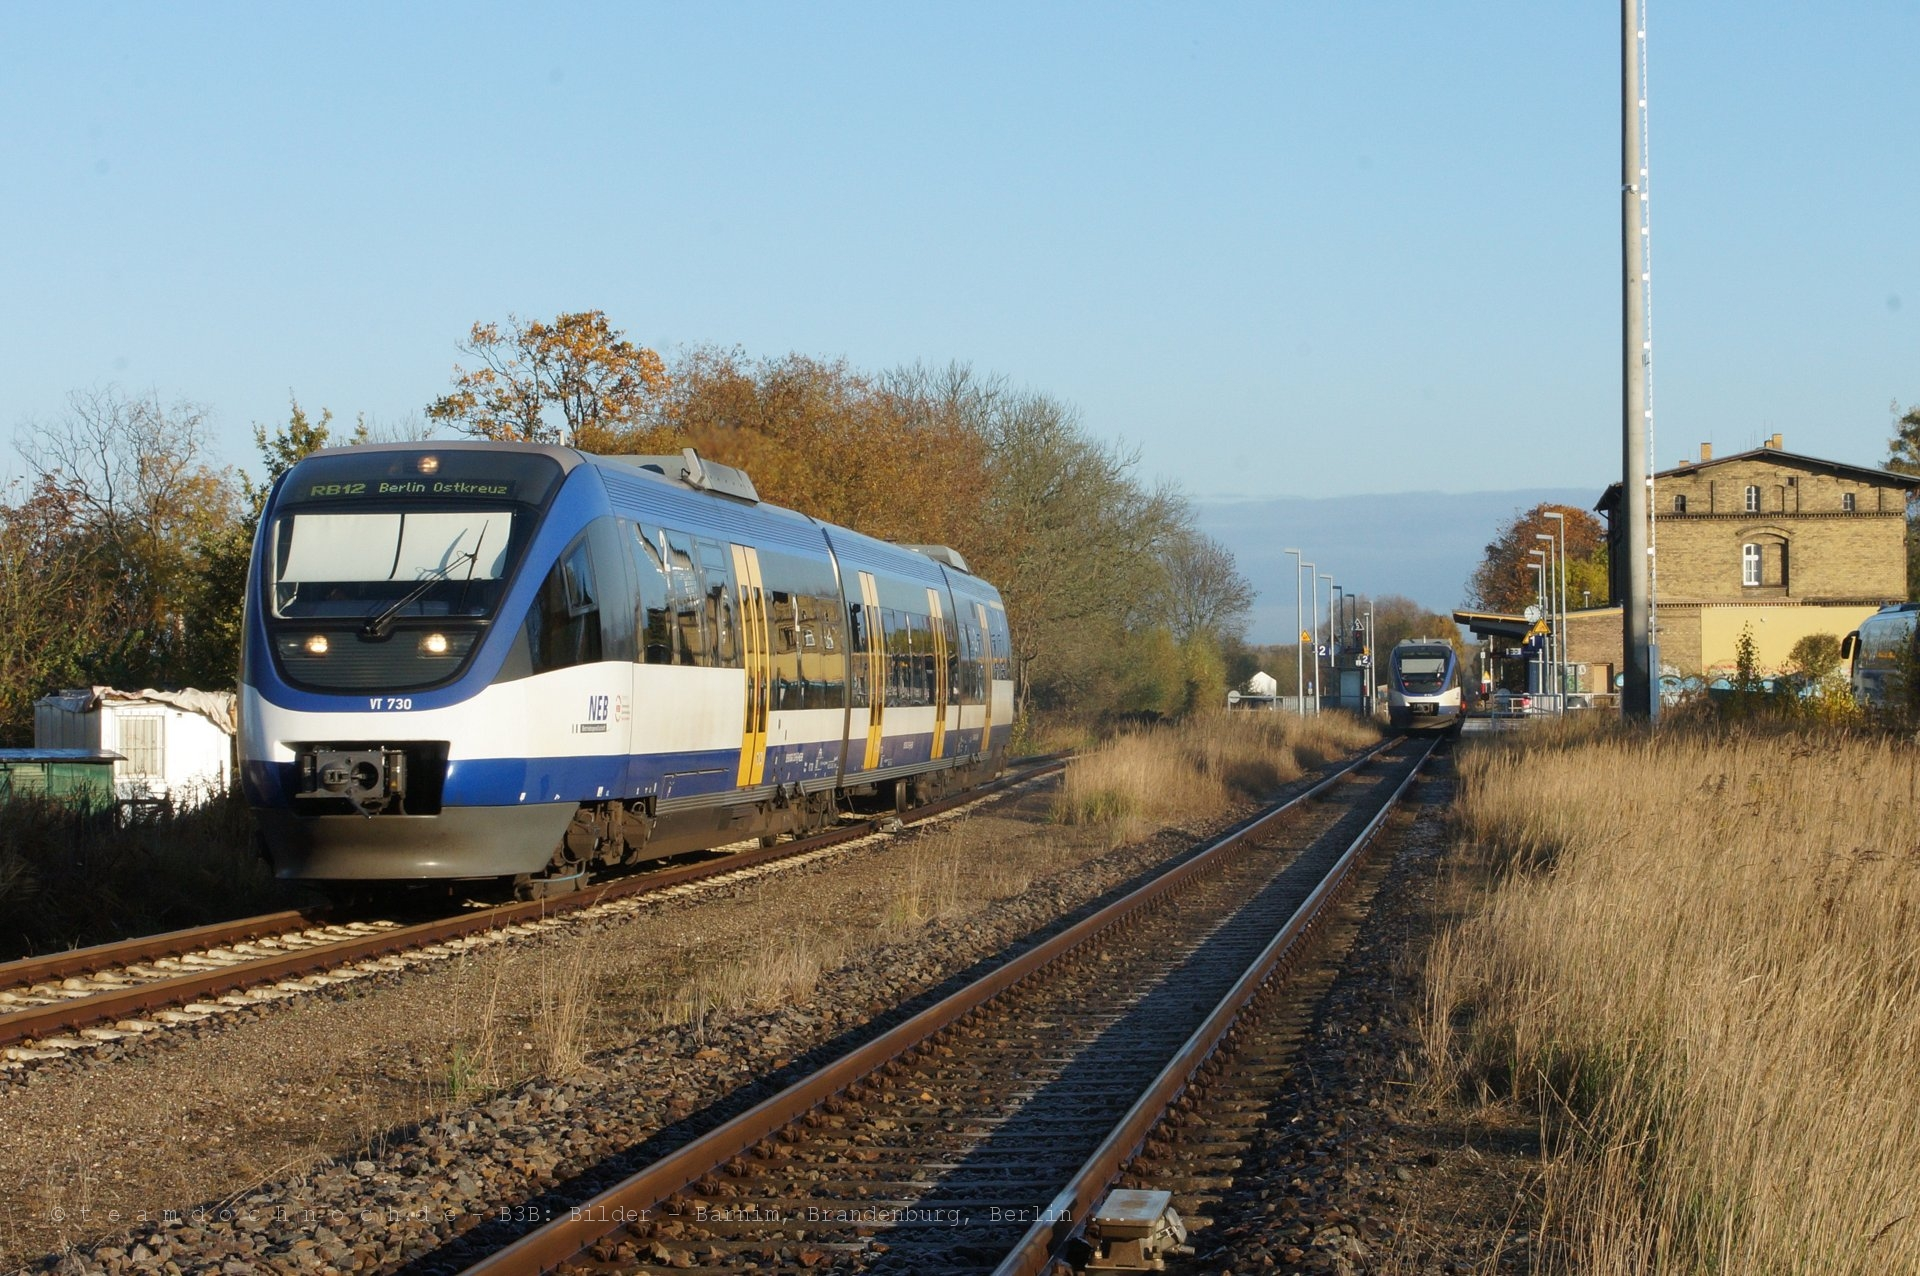 VT730 der NEB bei Ausfahrt aus dem Bahnhof Zehdenick